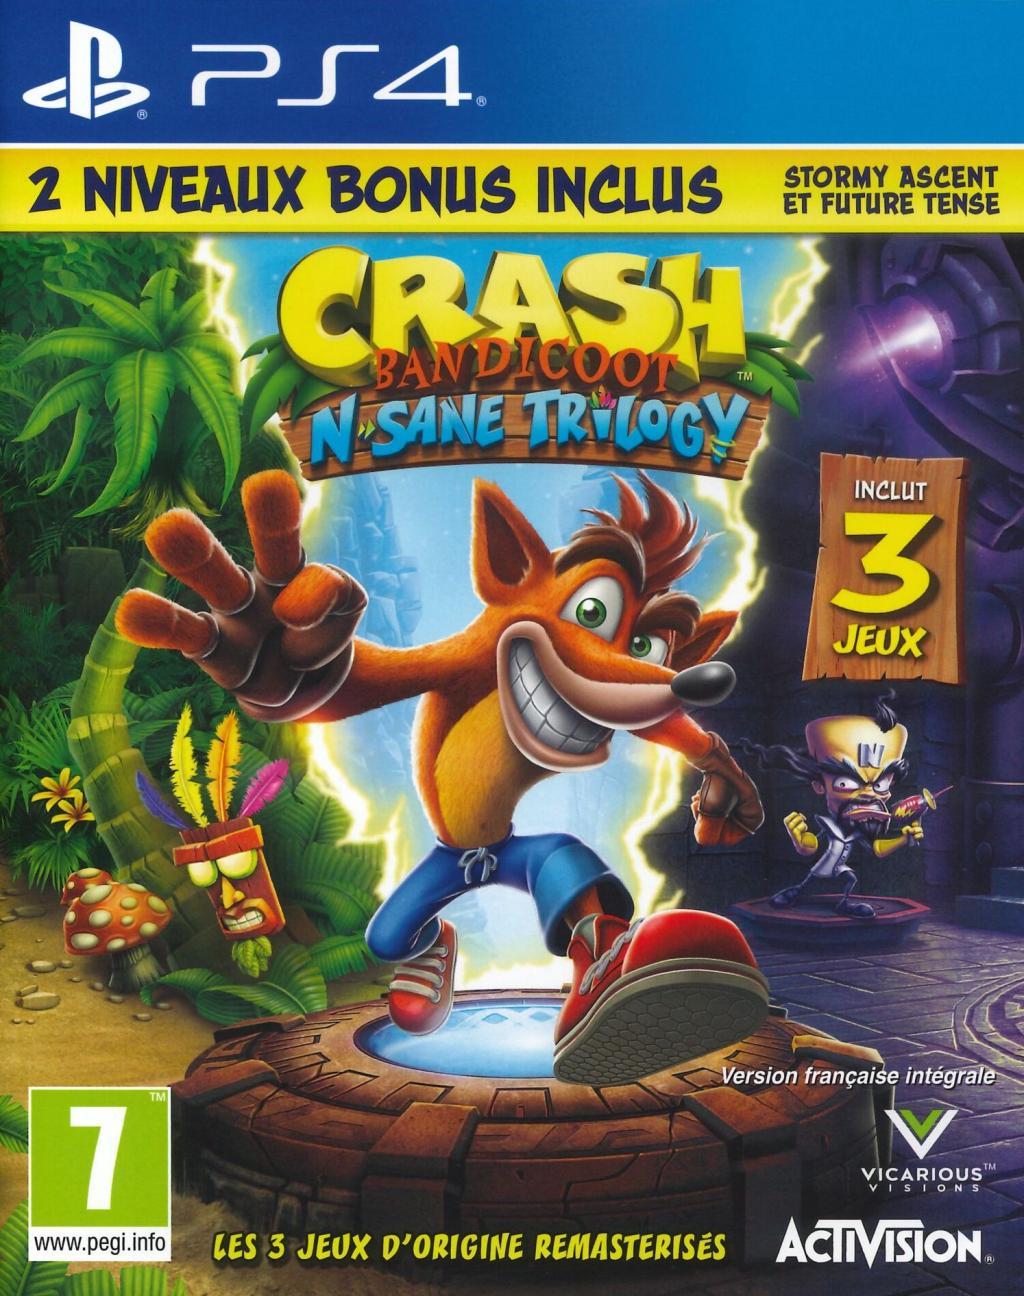 Crash Bandicoot : The N Sane Trilogy 2.0